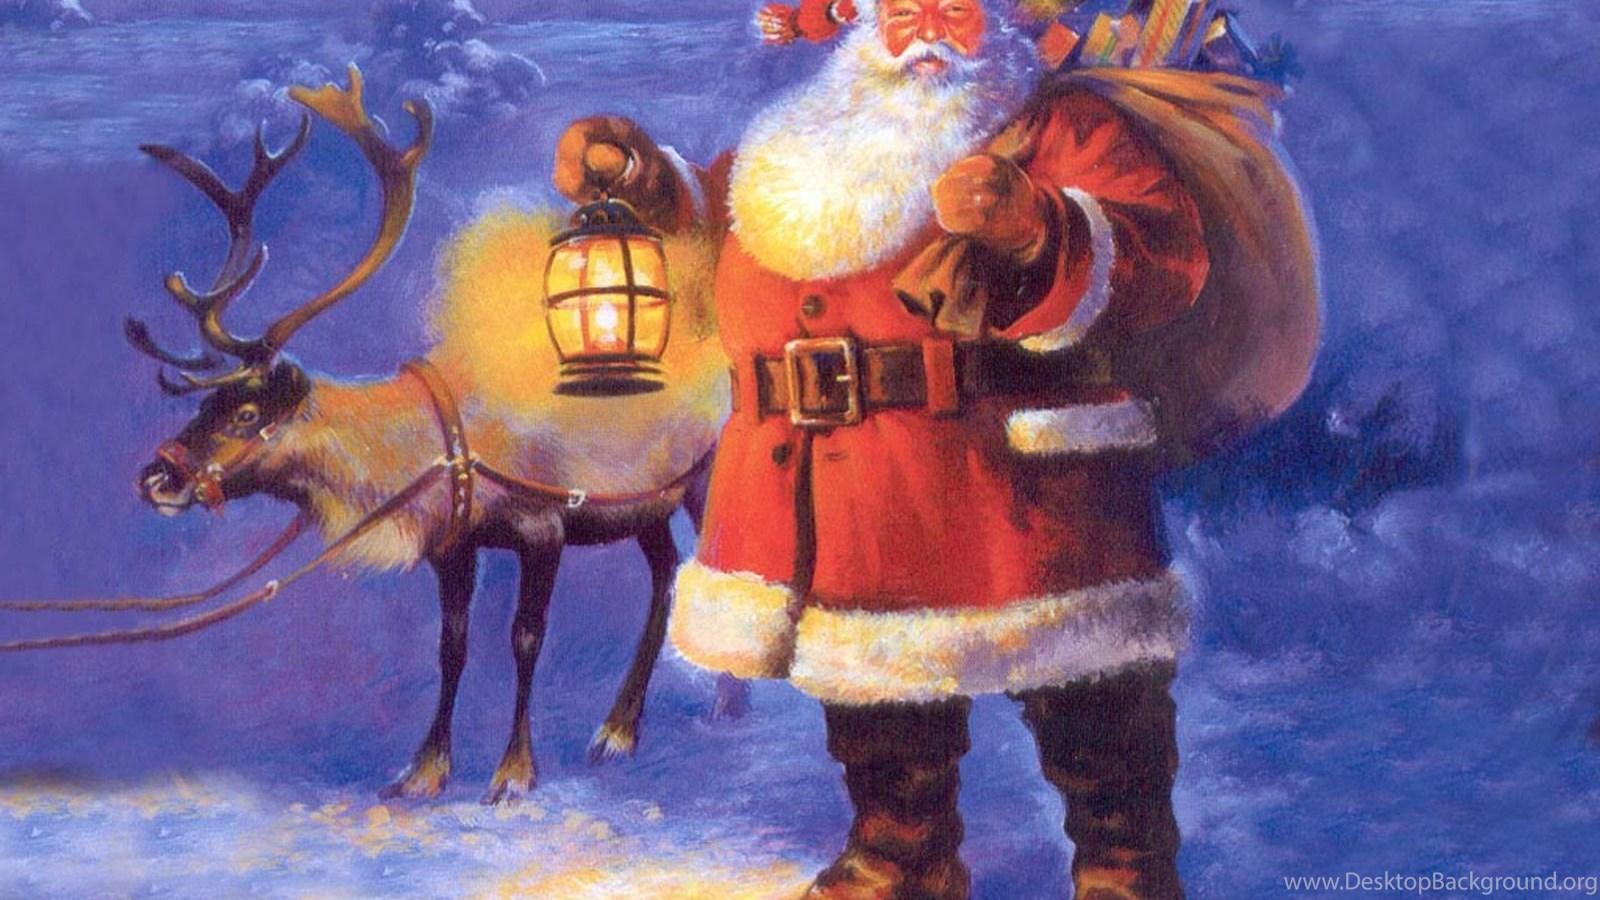 Christmas wallpaper free wallpapers downloads santabanta popular voltagebd Image collections